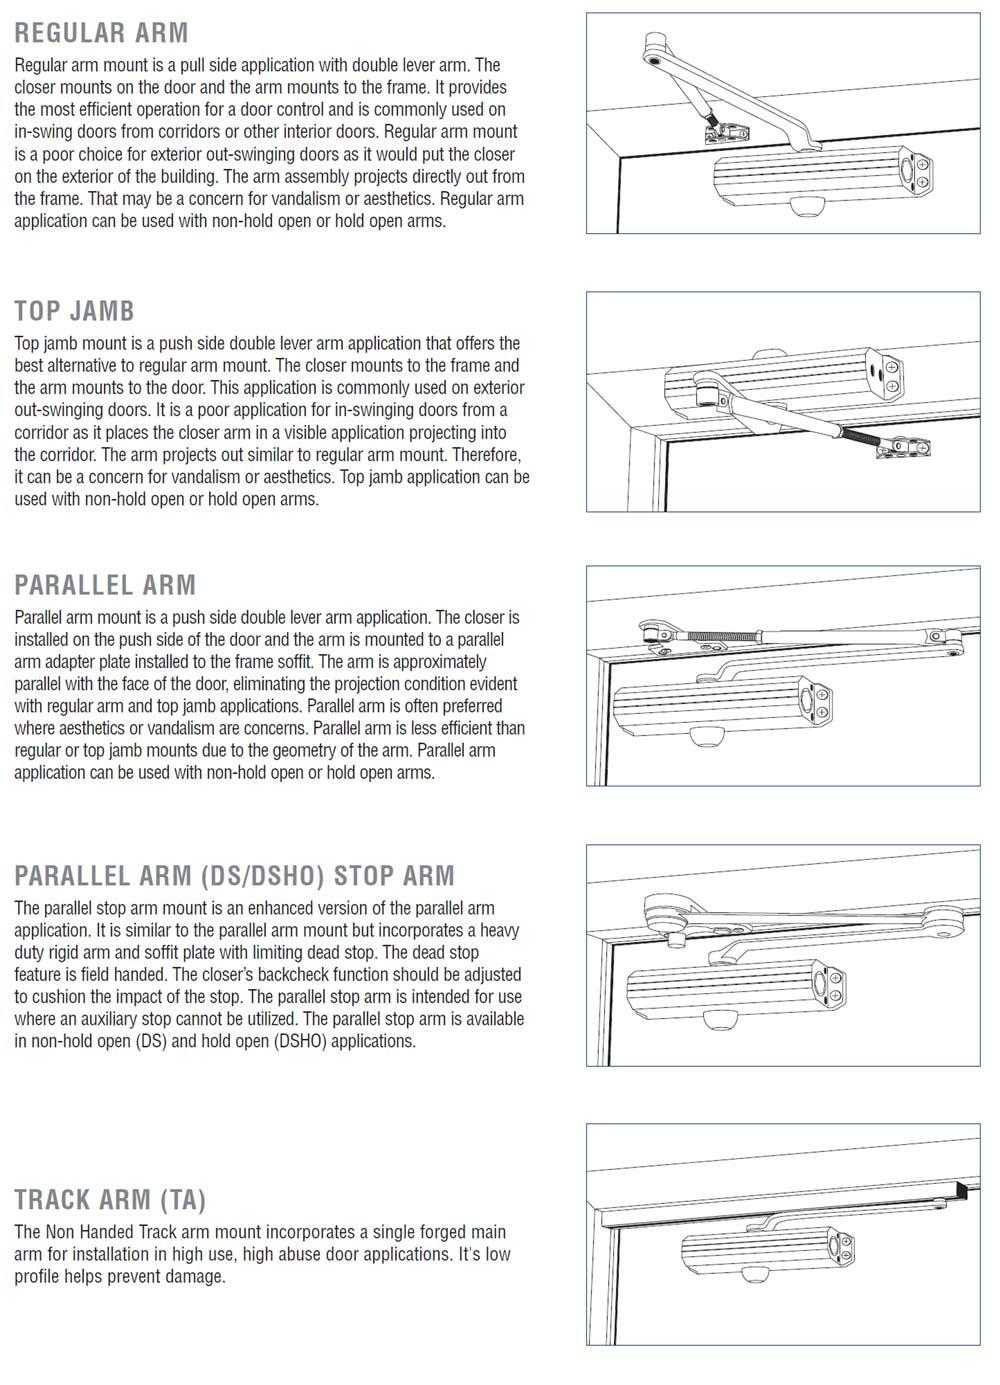 PDQ 3100 Applications | PDQ 3101 Applications | Barrier Free Door Closer